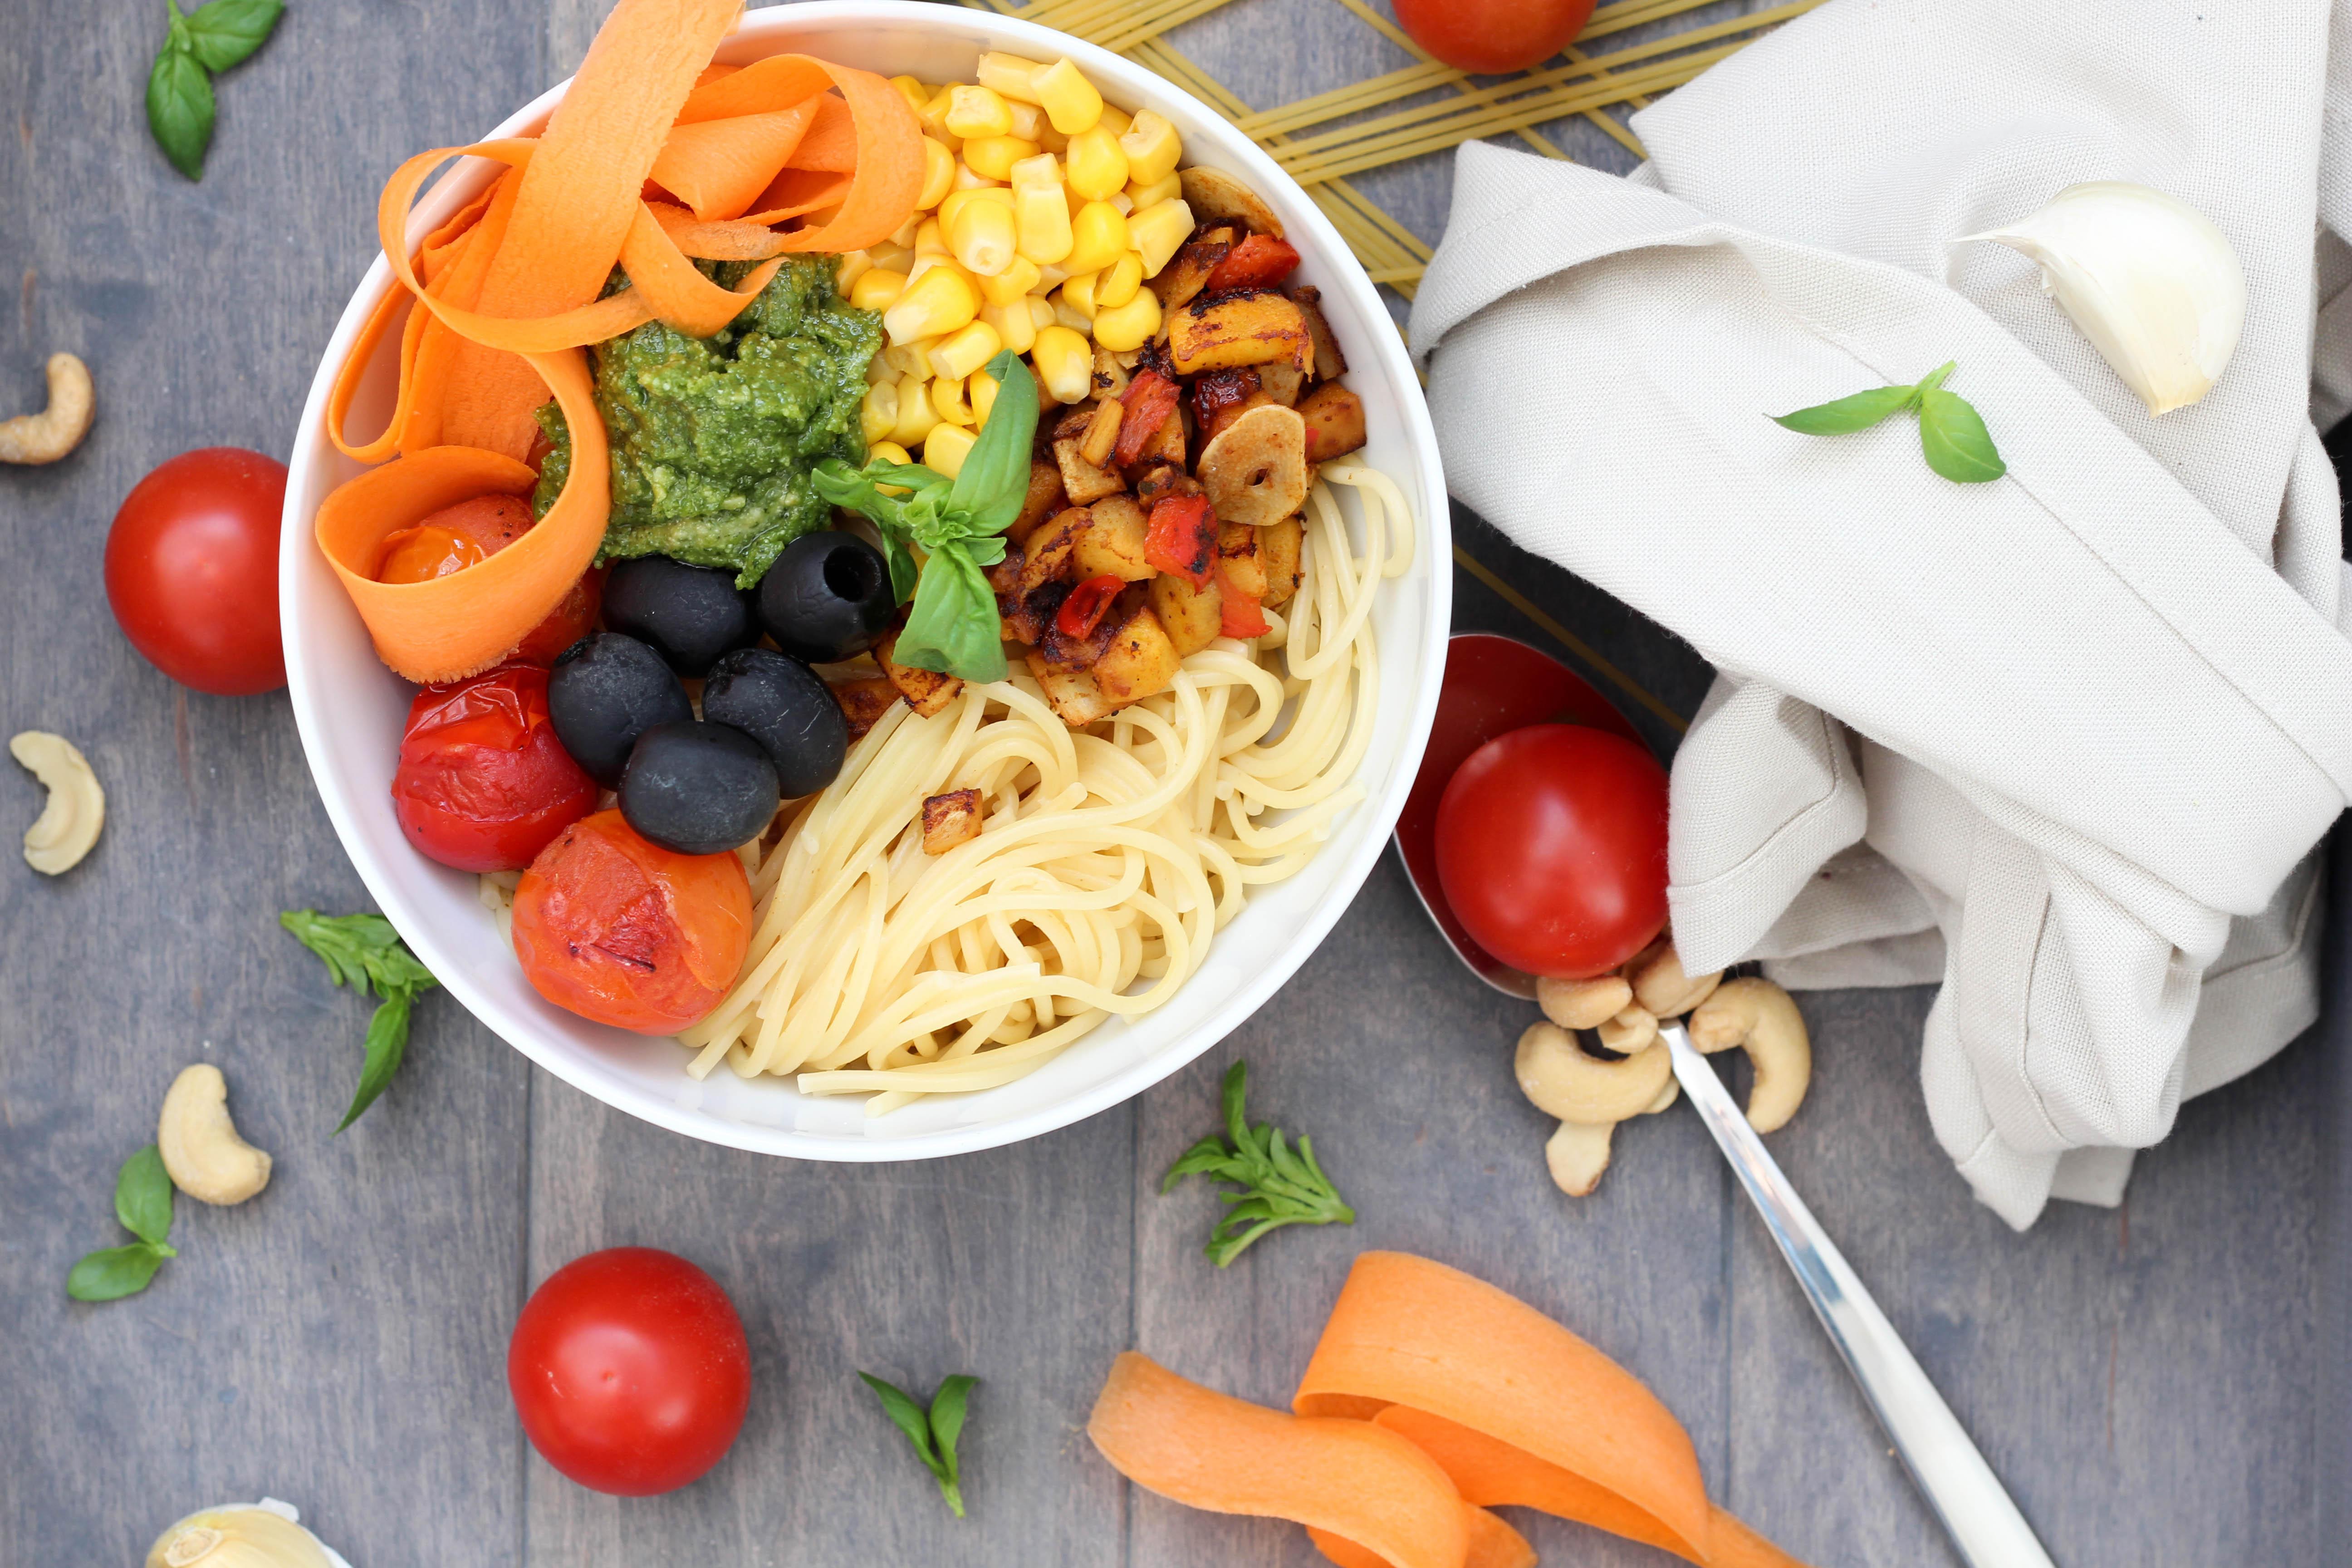 Vegan - Blog - DeinHomeSpa - Bowl- Bolognese - Powerfood - Healthy - Pesto